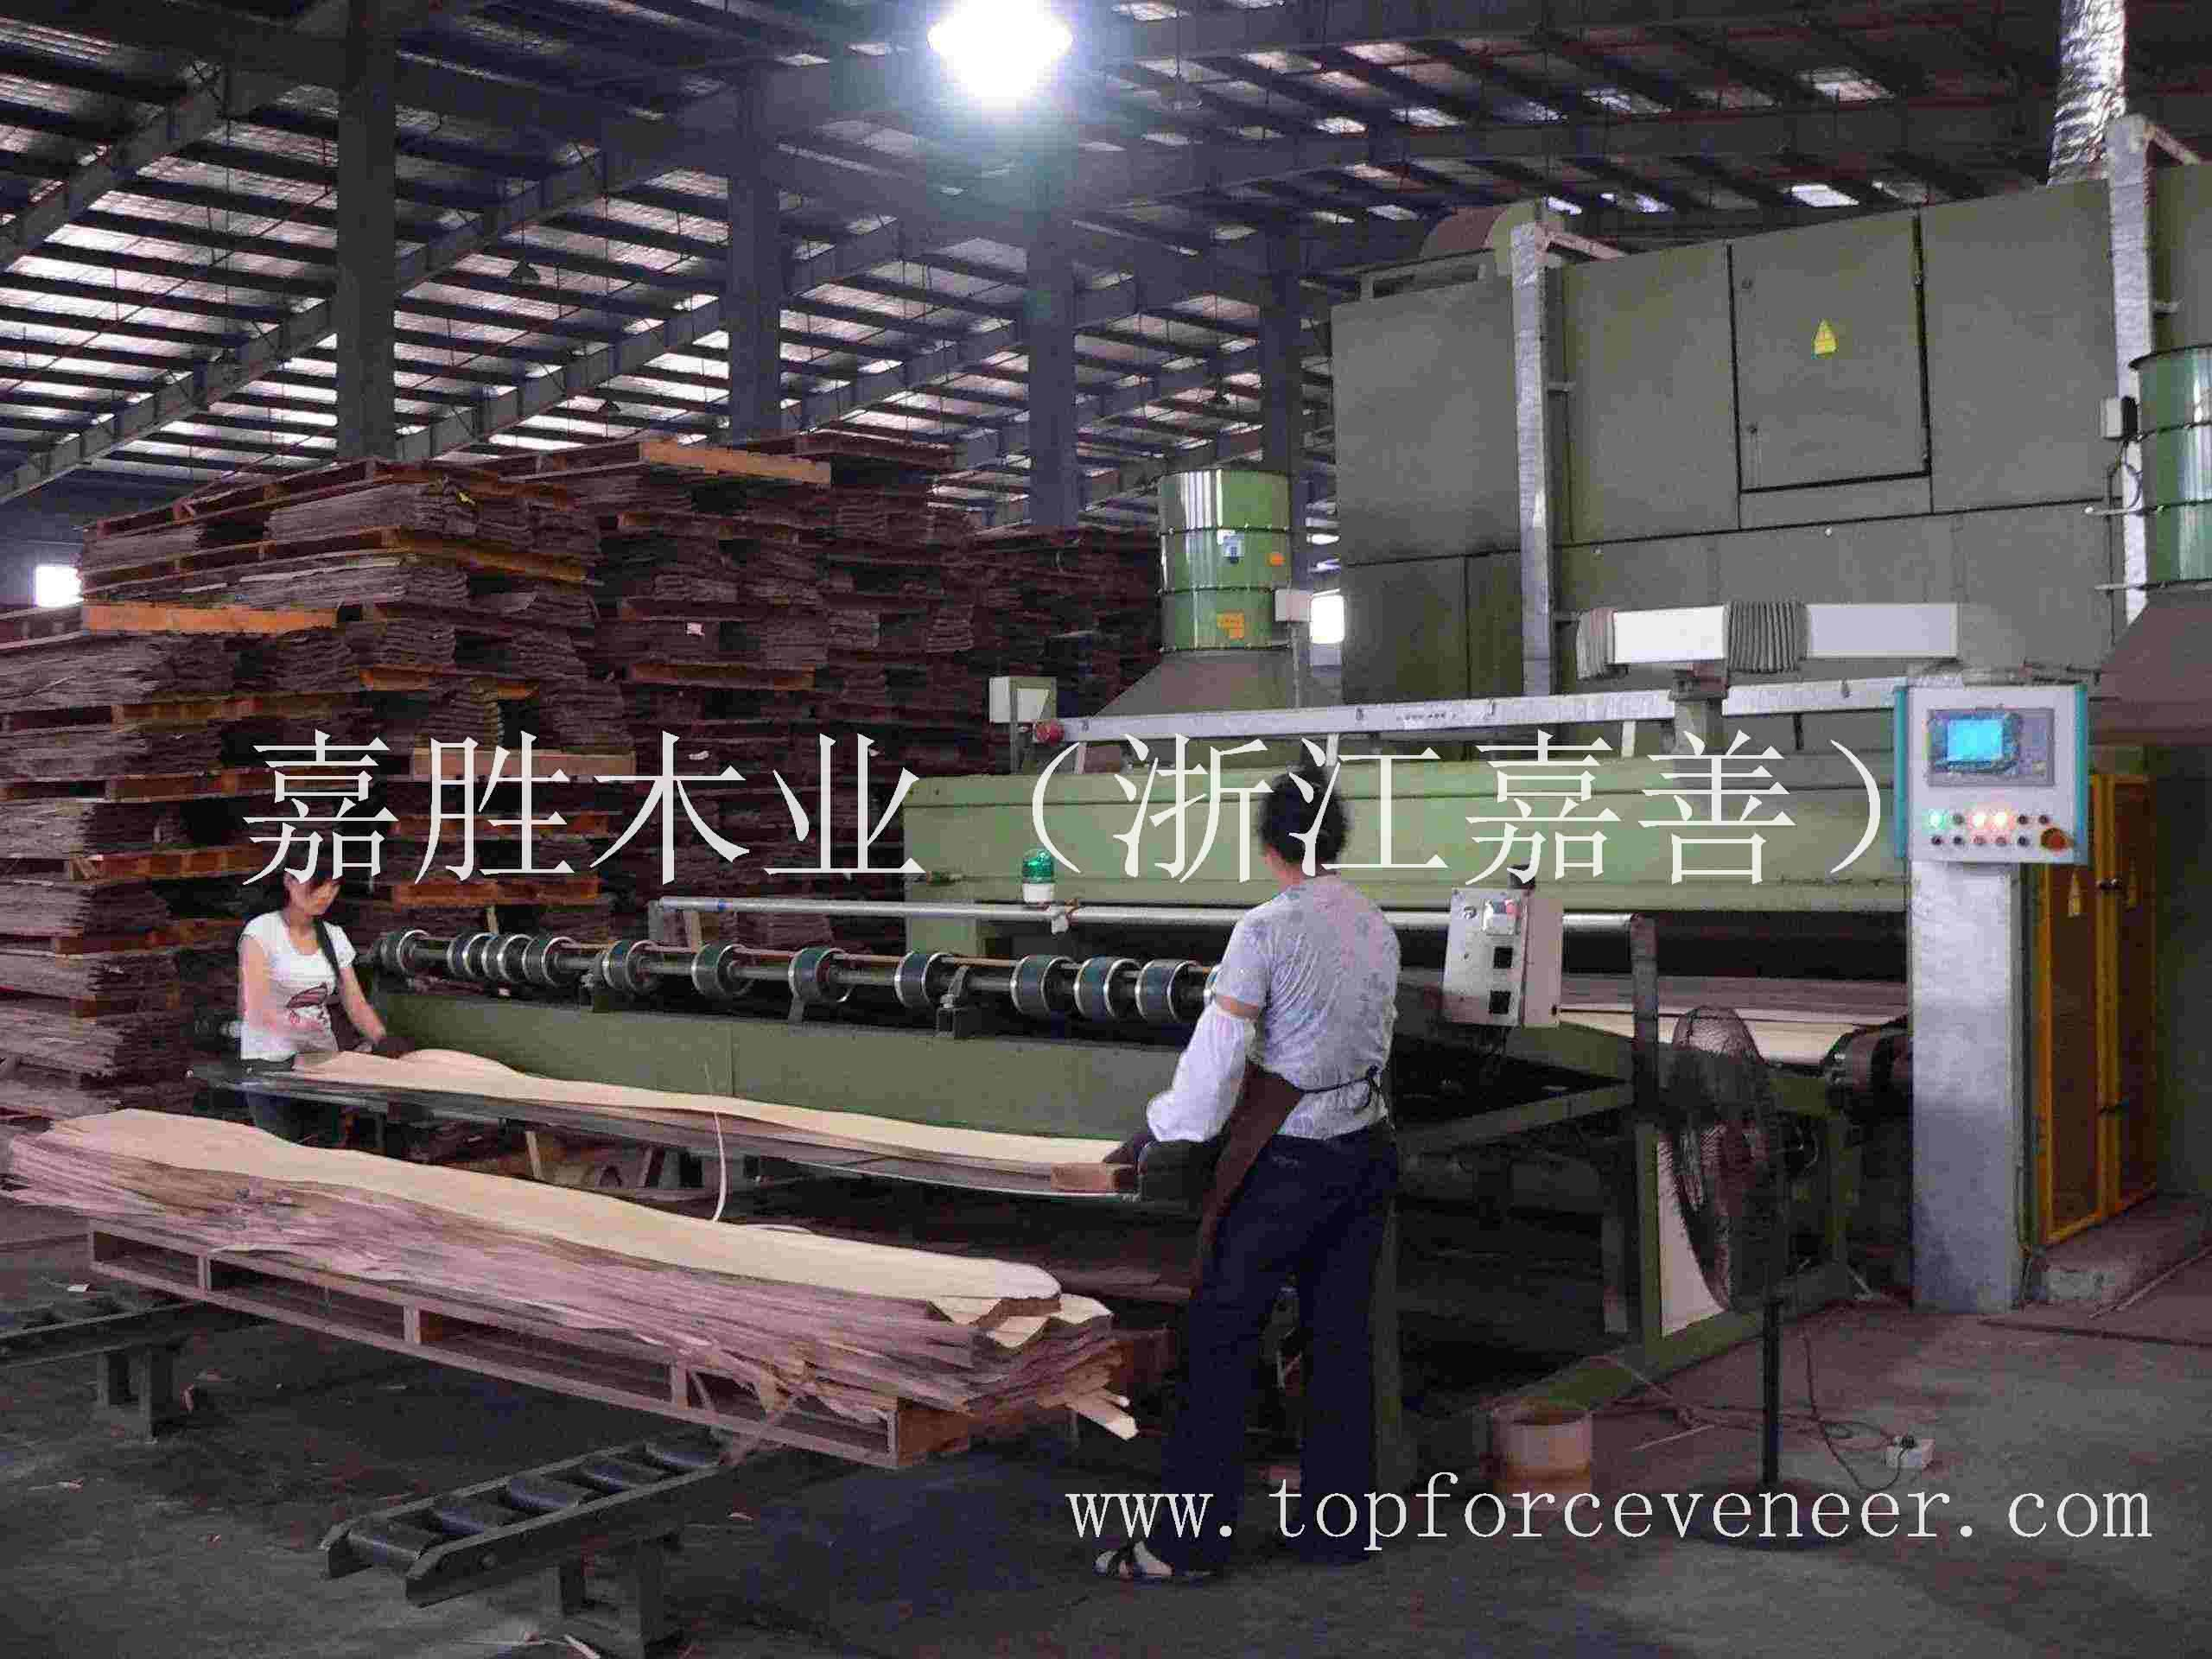 浙江木皮供应商 ZheJiang Jiaxing Jiashan Veneer Supplier